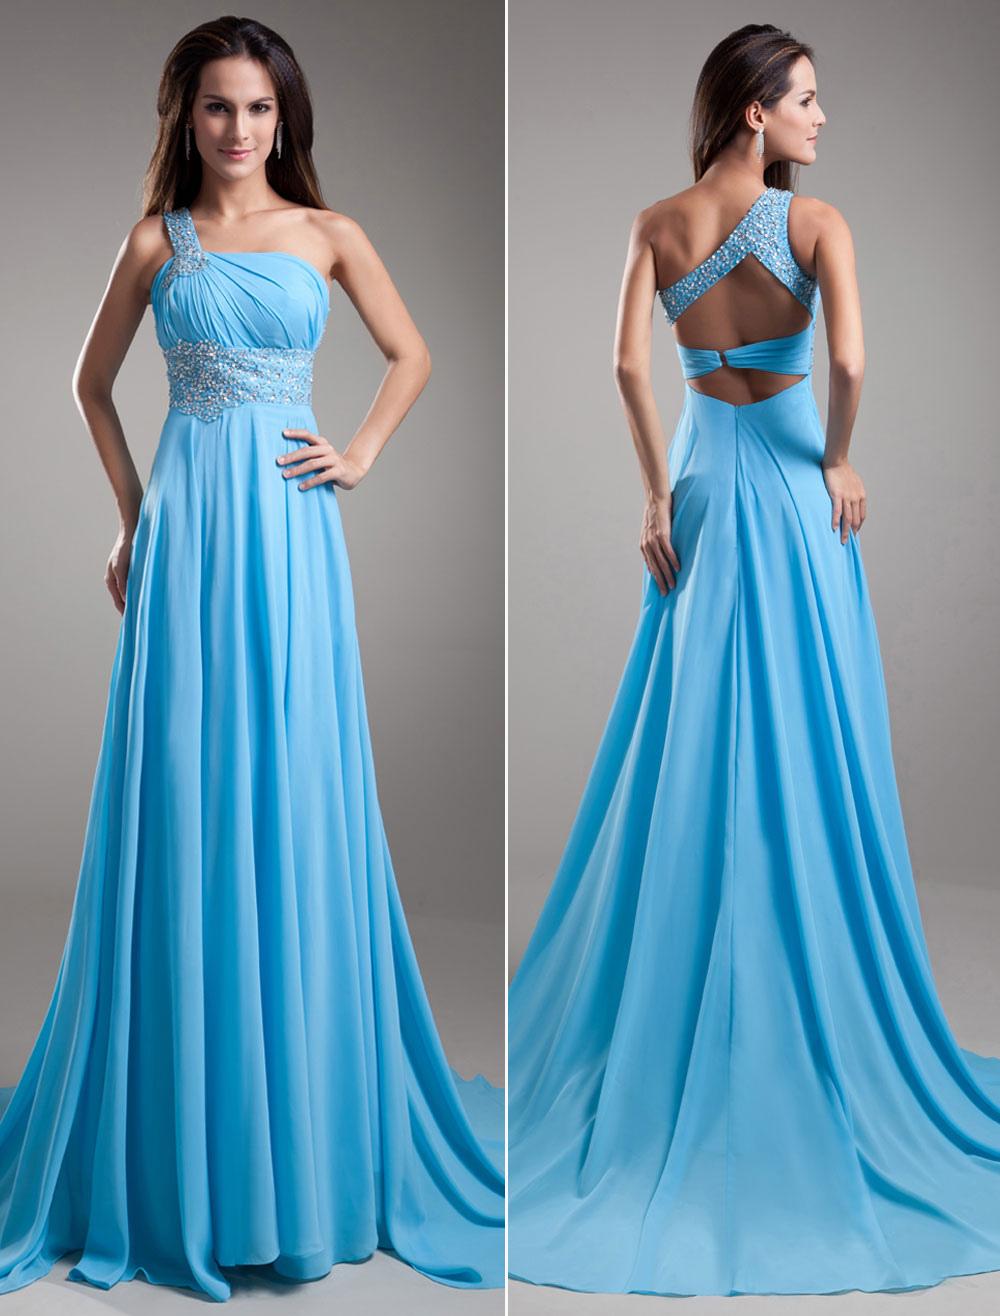 Chiffon Evening Dress Aqua One Shoulder Beaded Formal Dress Back Design Prom Dress With Chapel Train